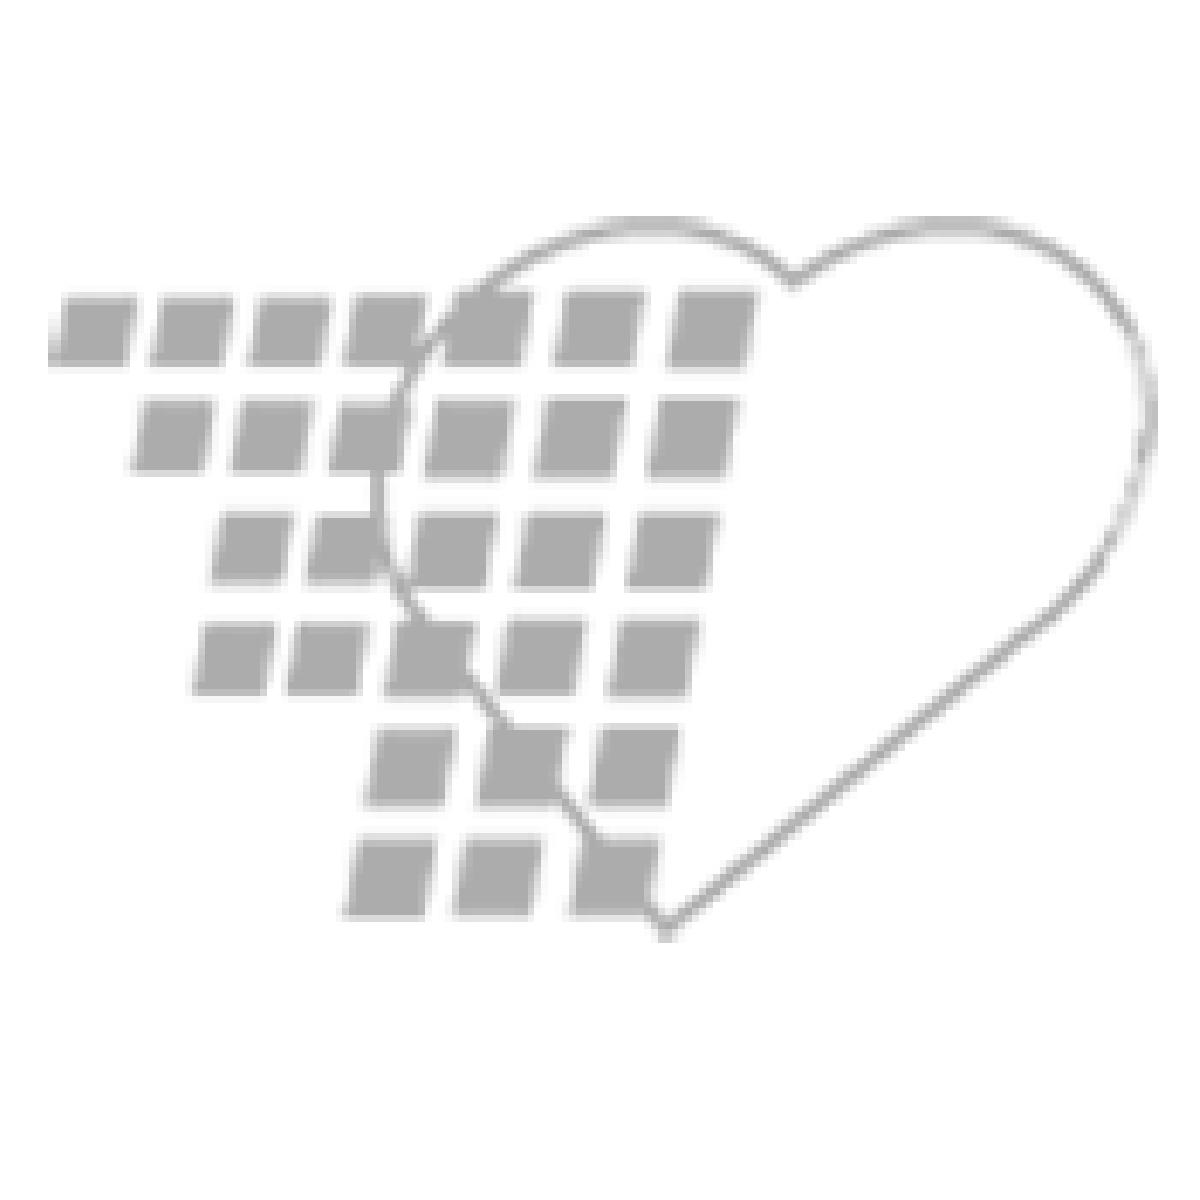 "06-26-2500 - B.Braun Introcan Safety IV Catheter - 24G x 3/4"" Straight"